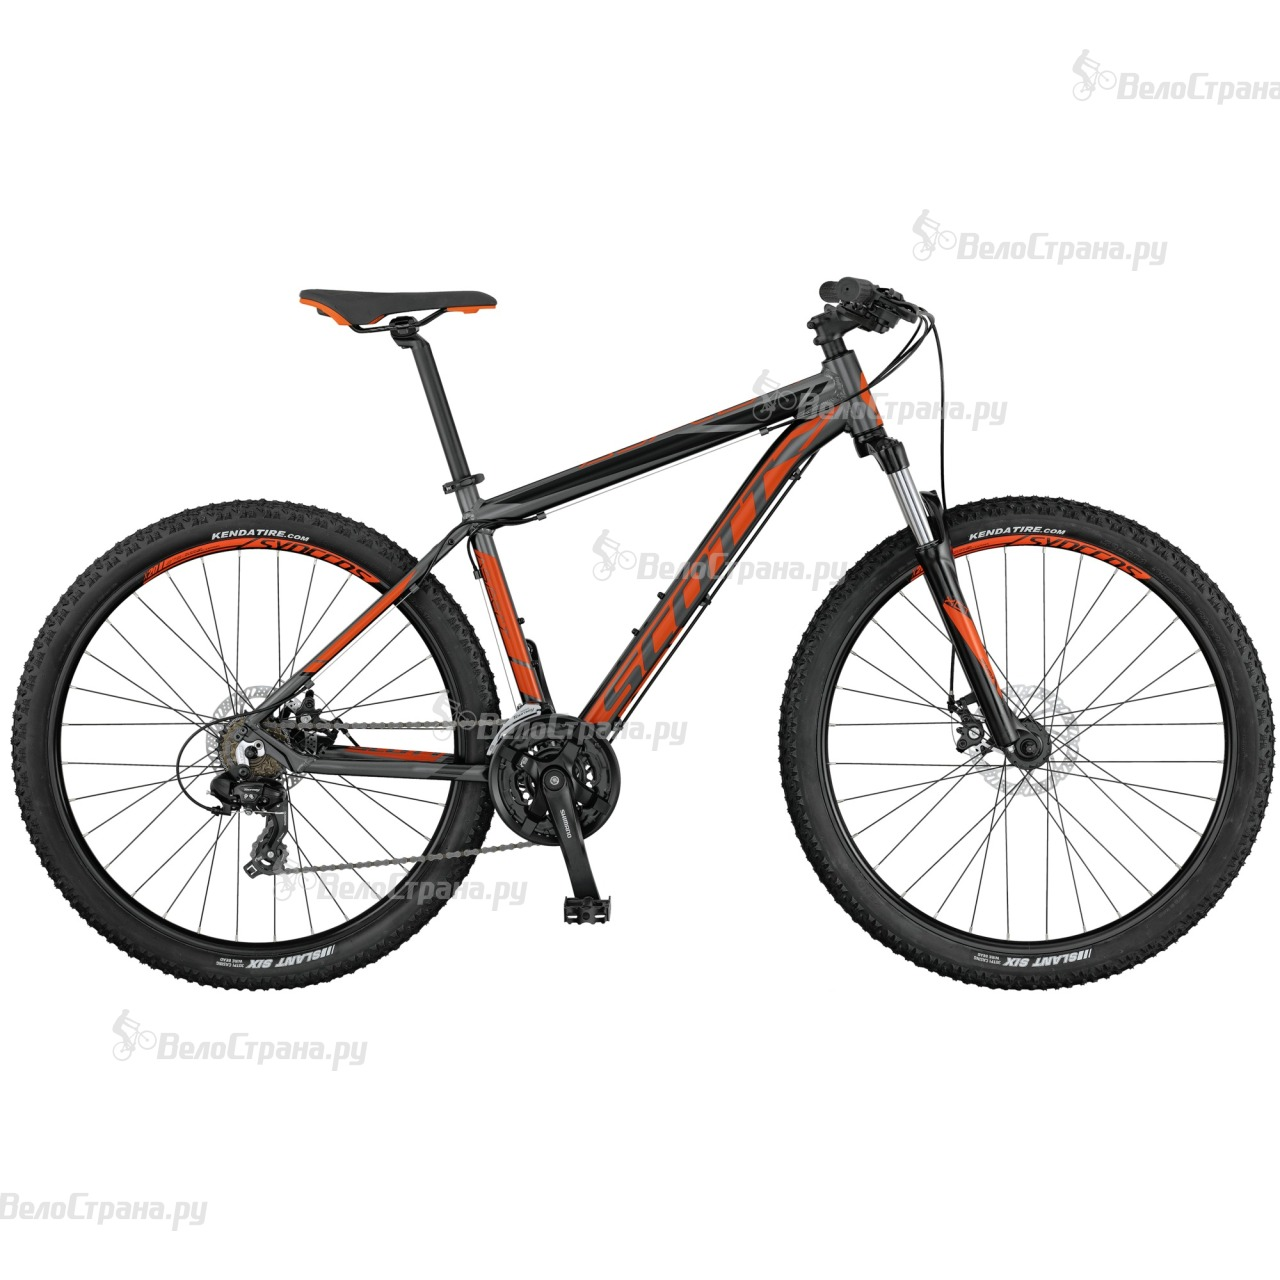 Велосипед Scott Aspect 770 (2017)